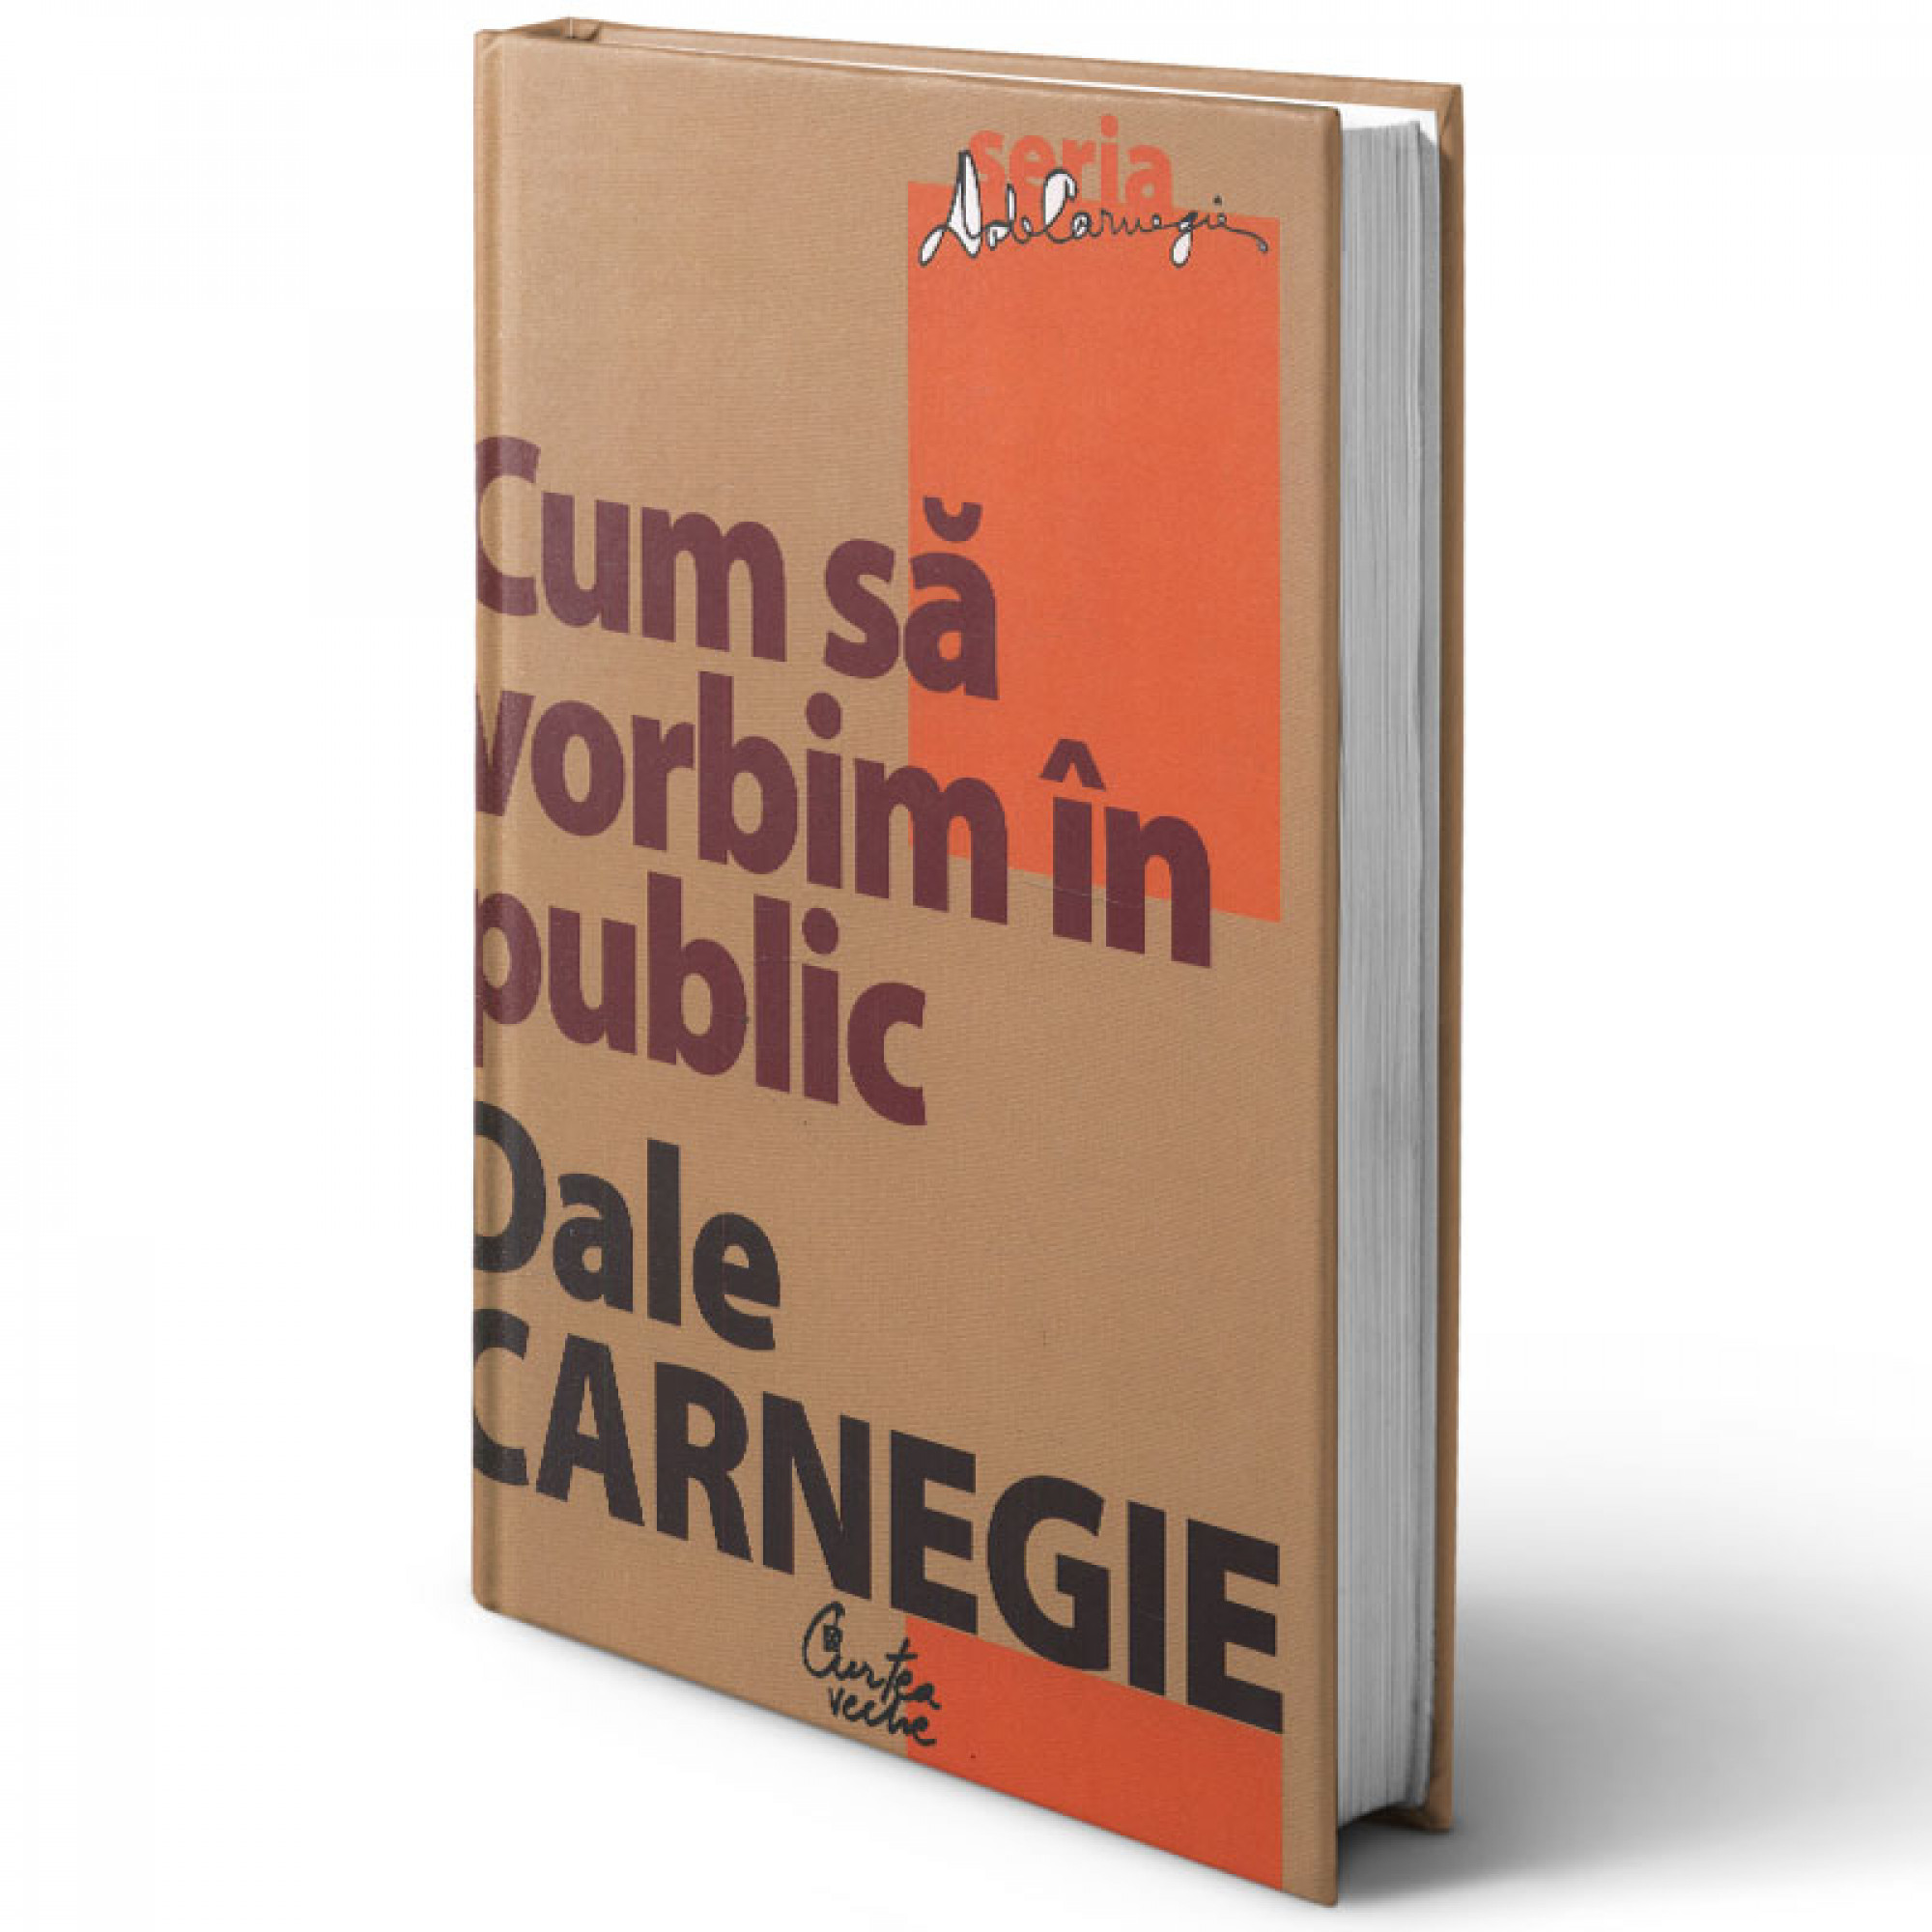 Cum să vorbim în public - Editia a II-a; Dale Carnegie